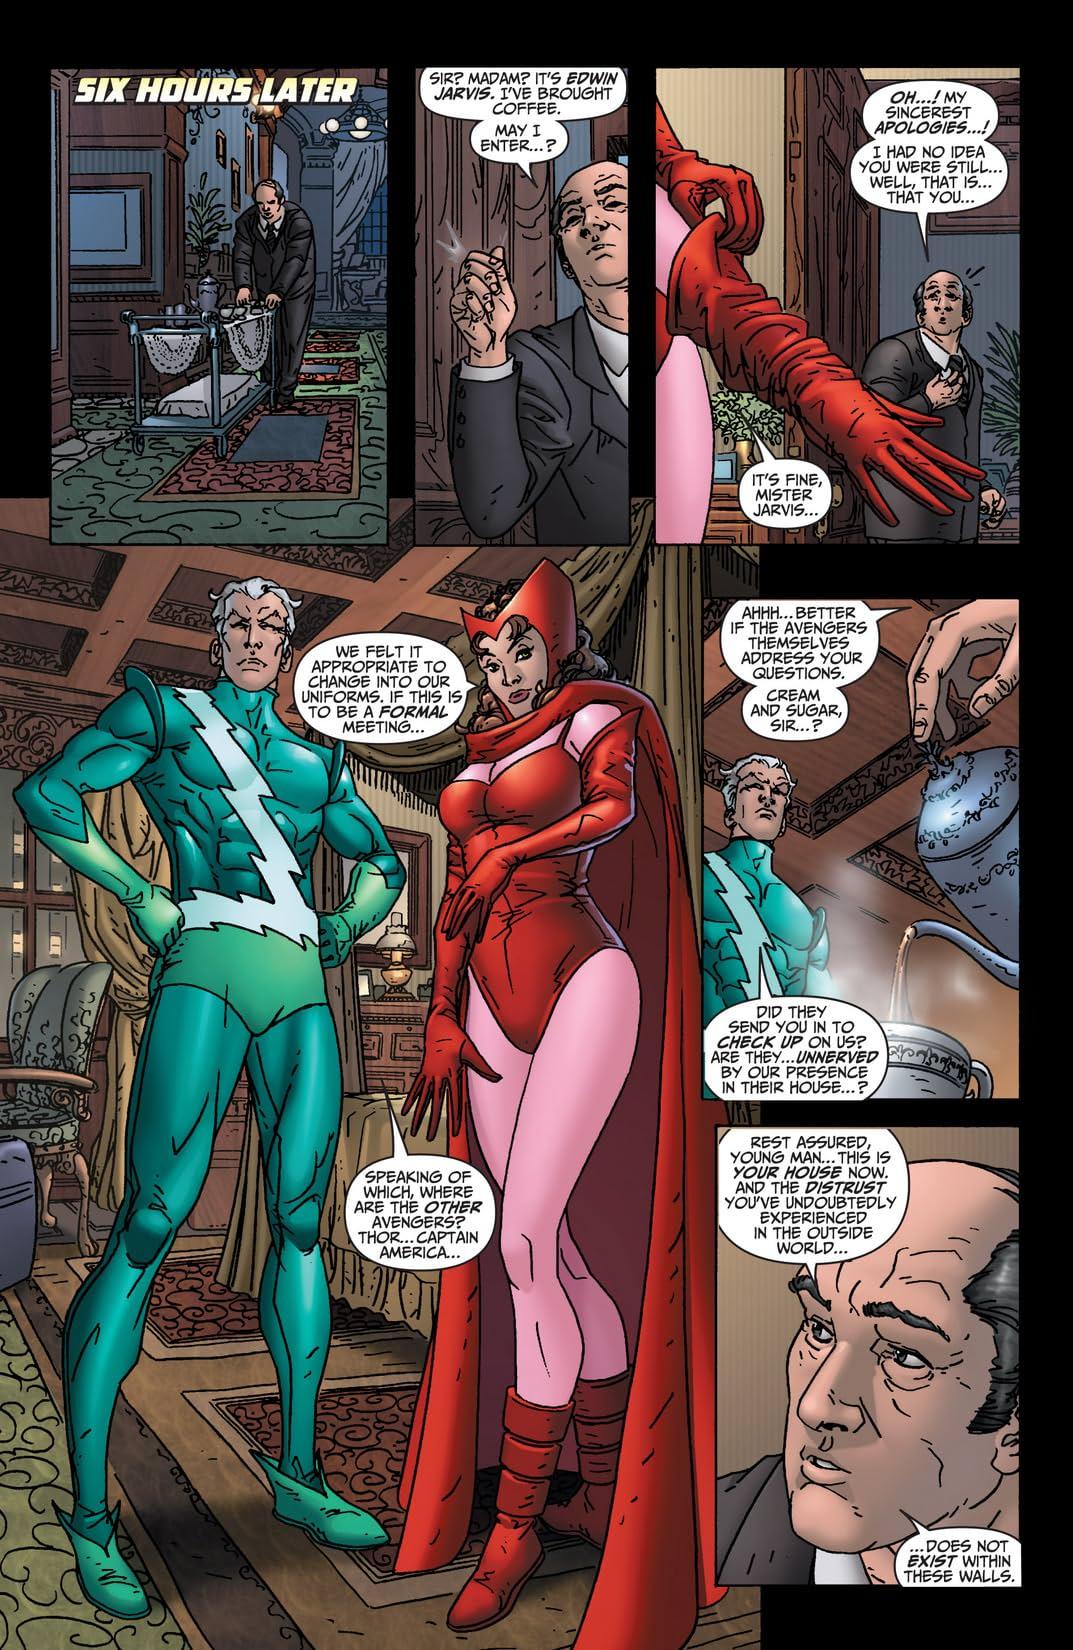 Avengers: Earth's Mightiest Heroes (2004-2005) #8 (of 8)